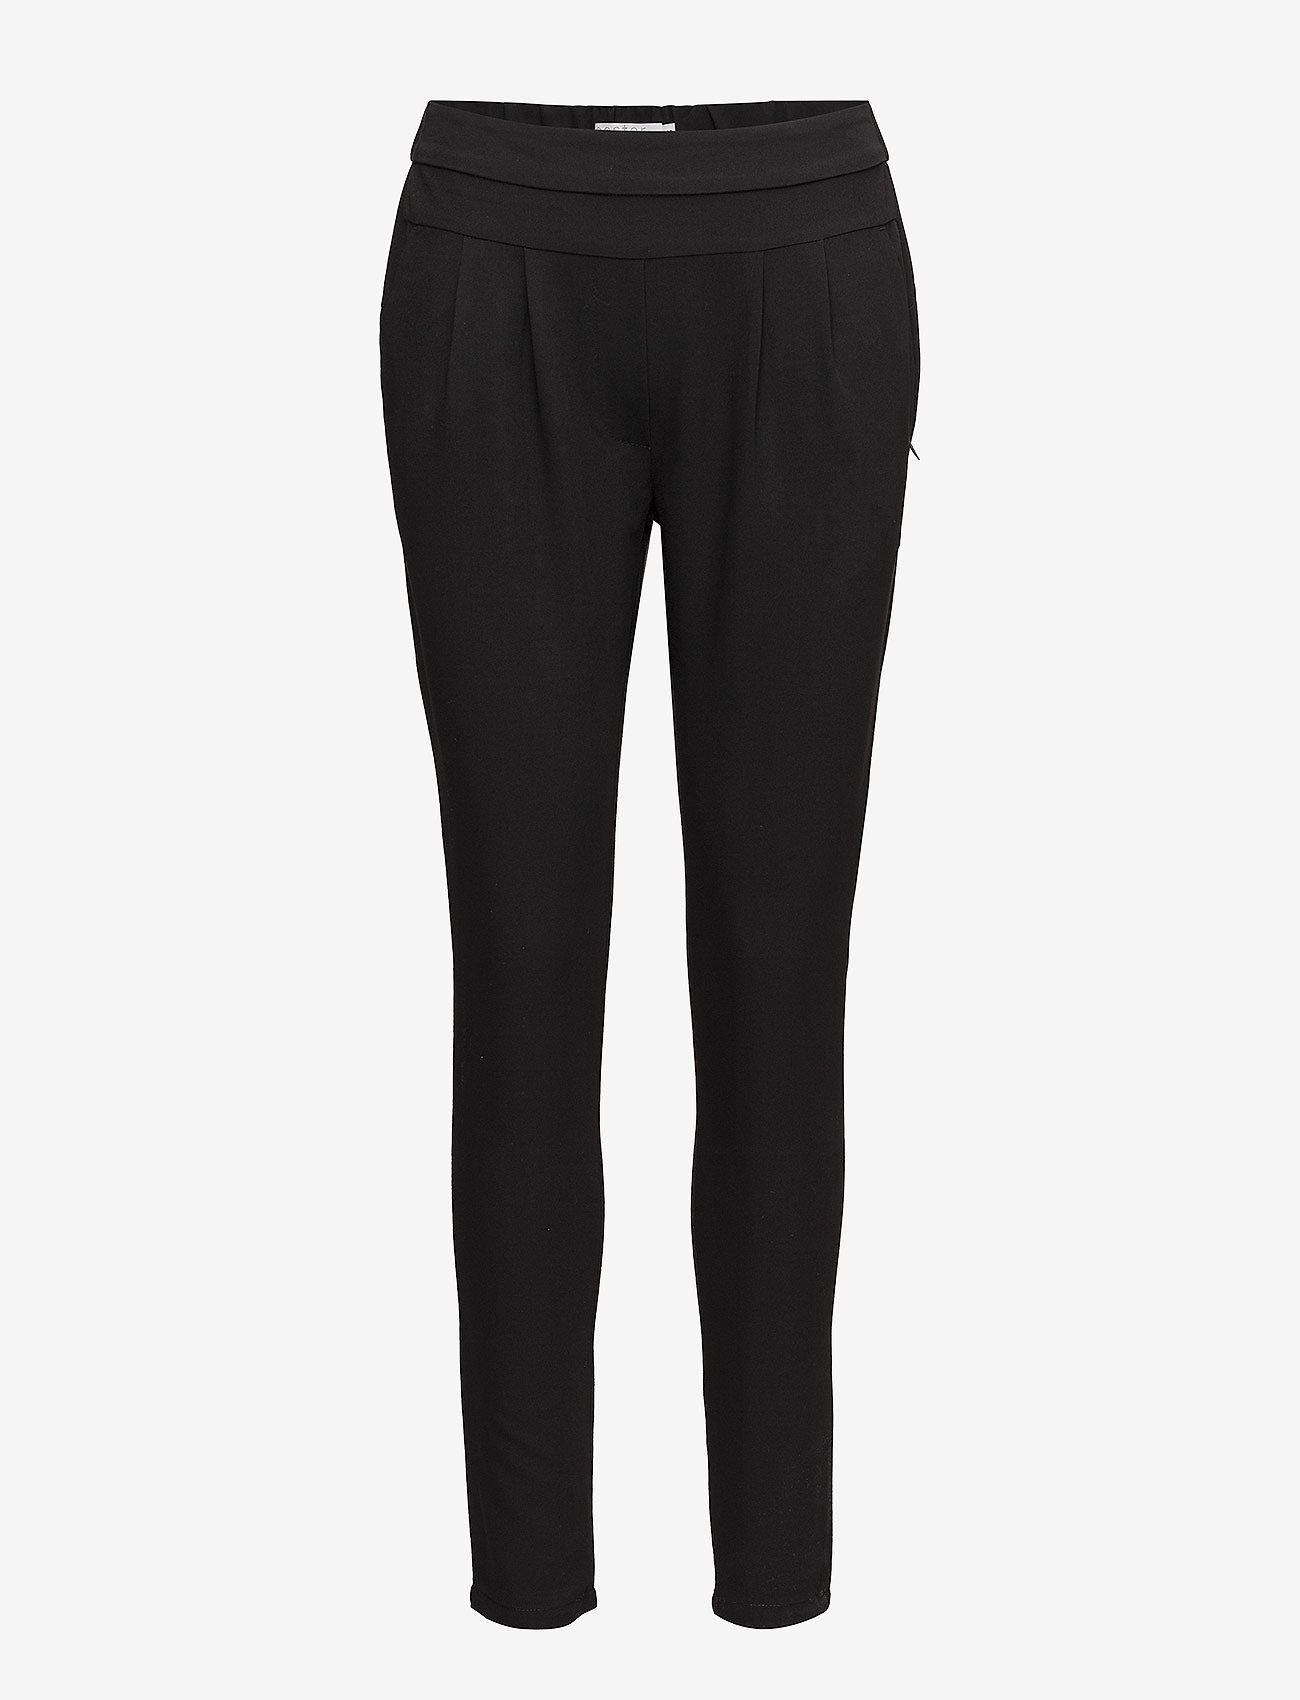 Coster Copenhagen - Pants w. Jersey back - Luca - broeken med skinny fit - black - 0